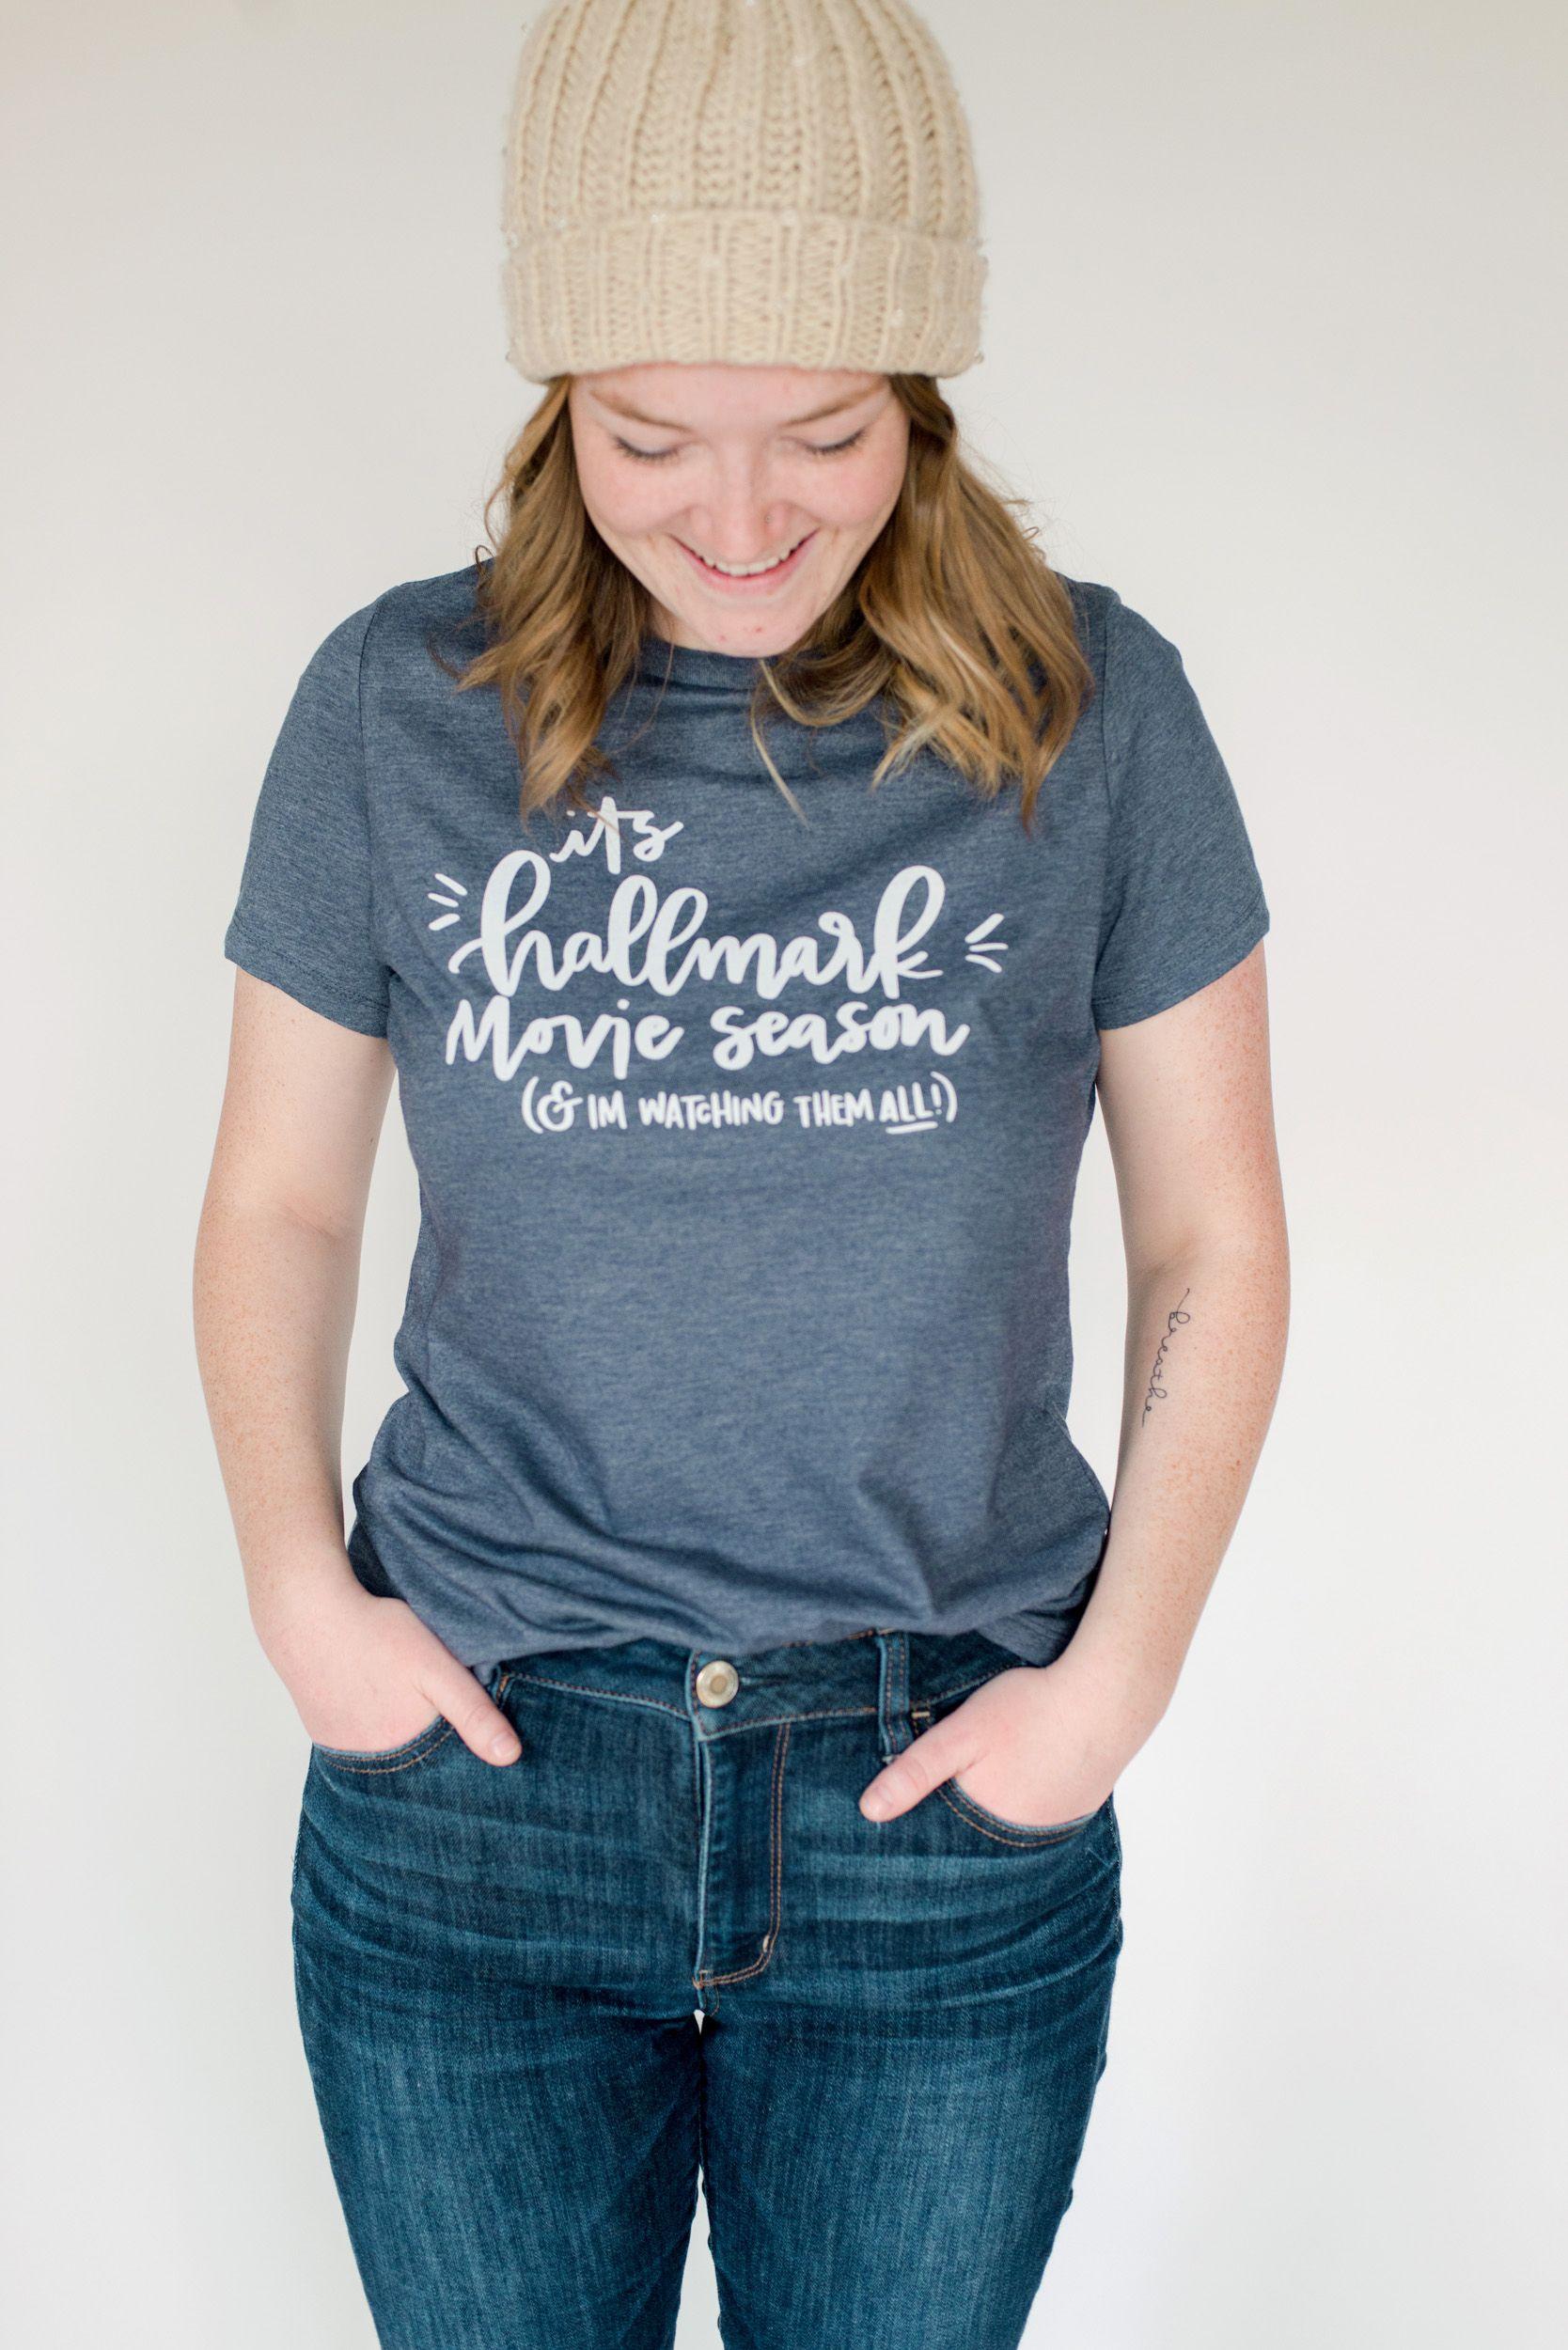 Hallmark Christmas T Shirt.Do You Love The Hallmark Channel As Much As You Love